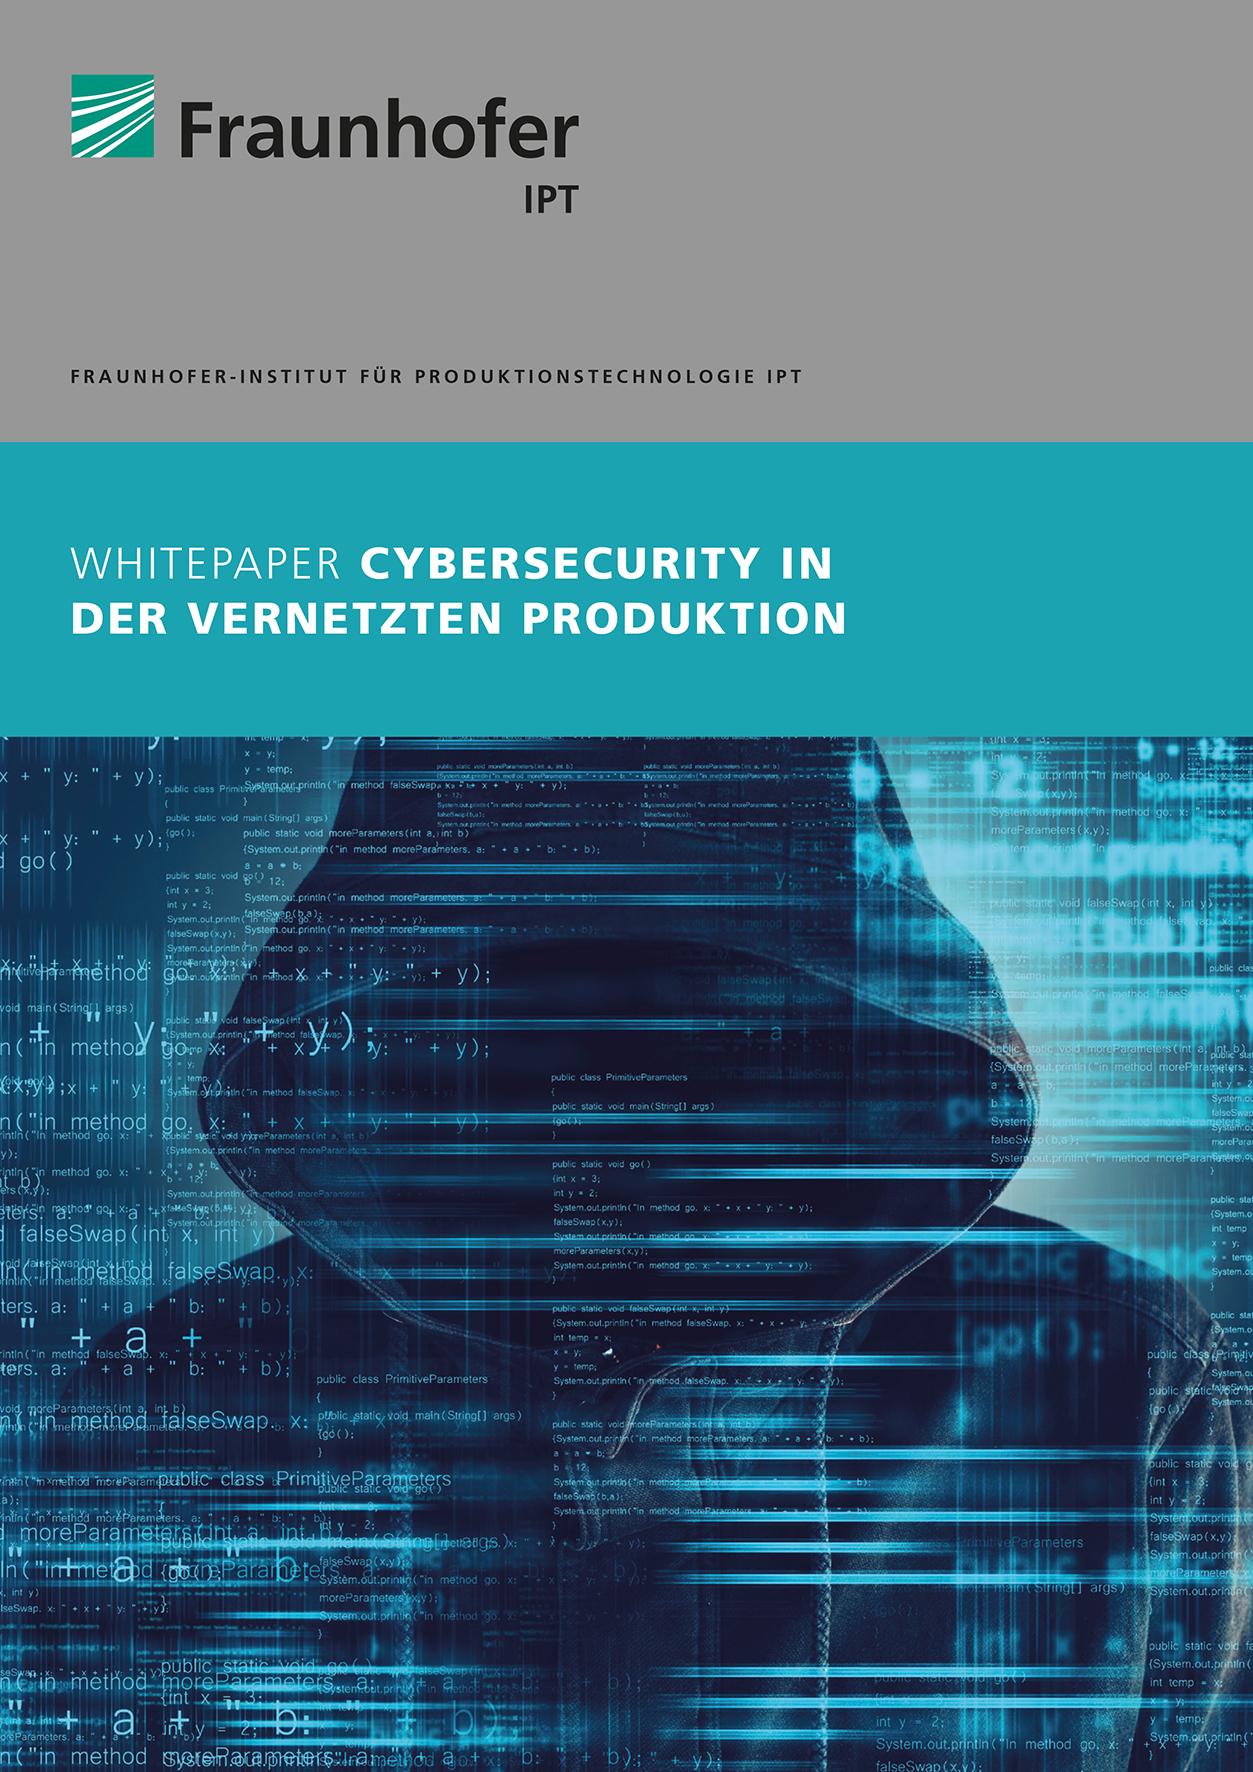 CybersecurityUntersuchungin der Industrie